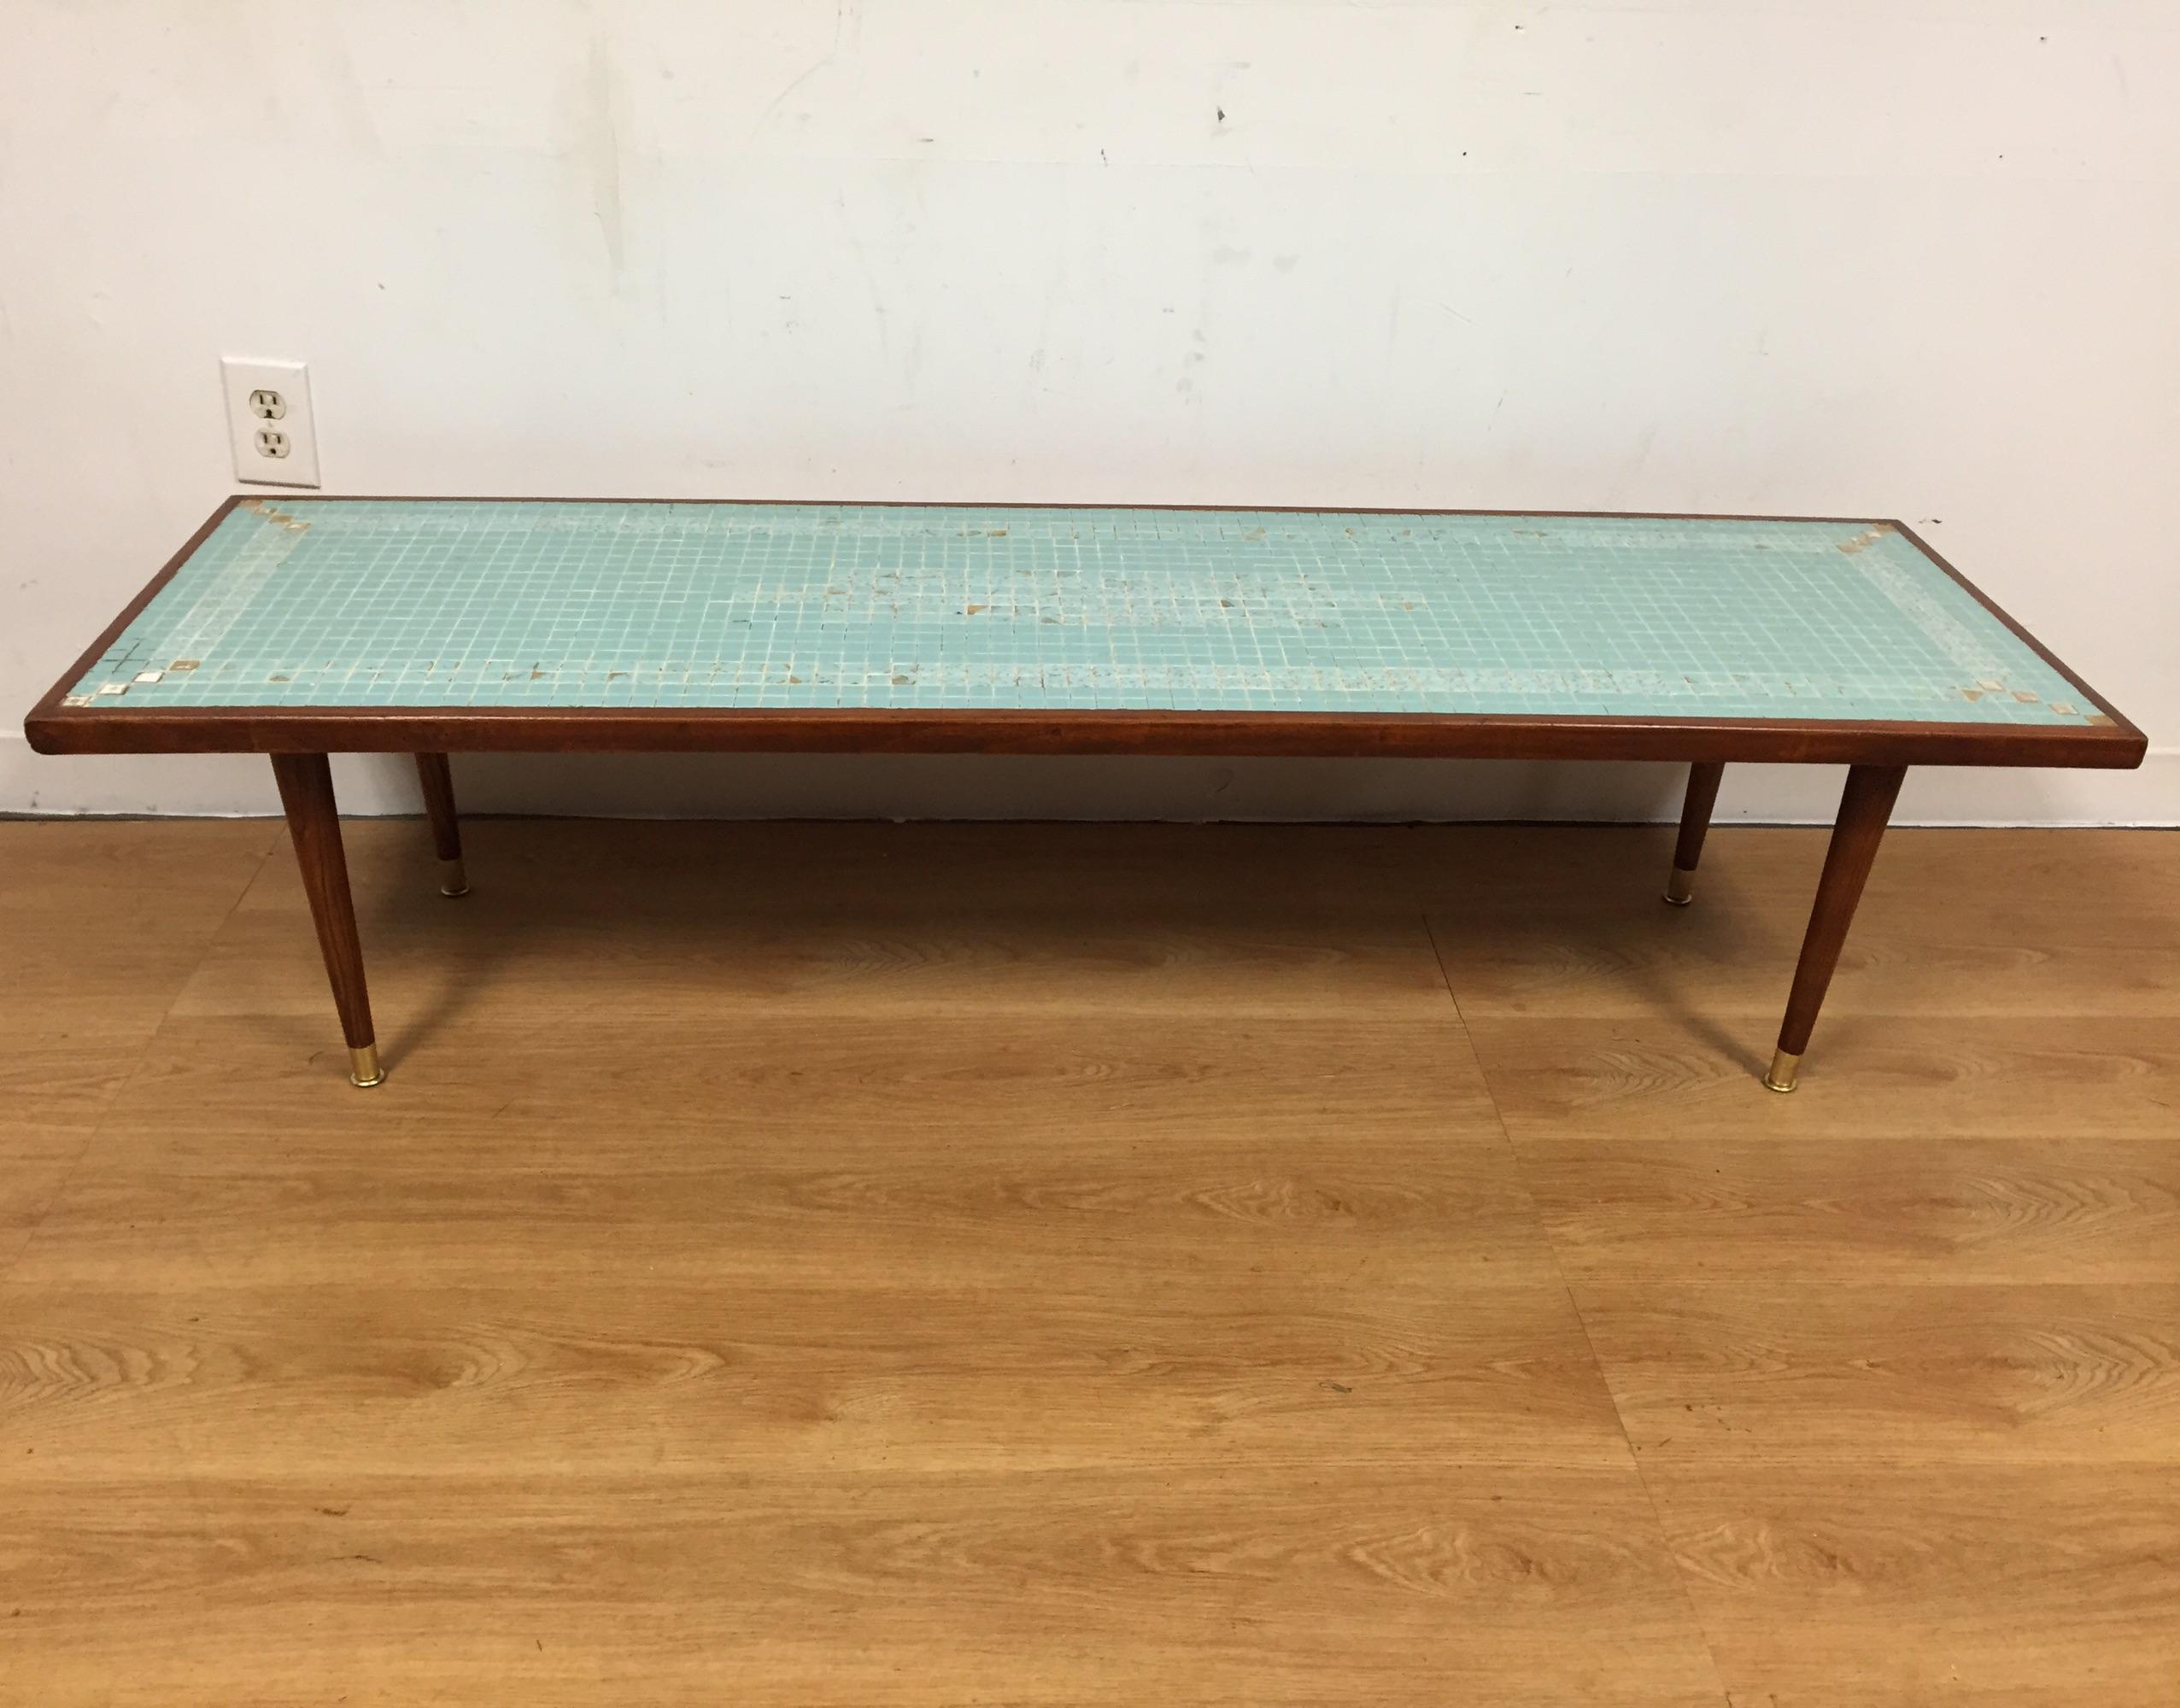 MidCentury Tile Top Coffee Table Chairish